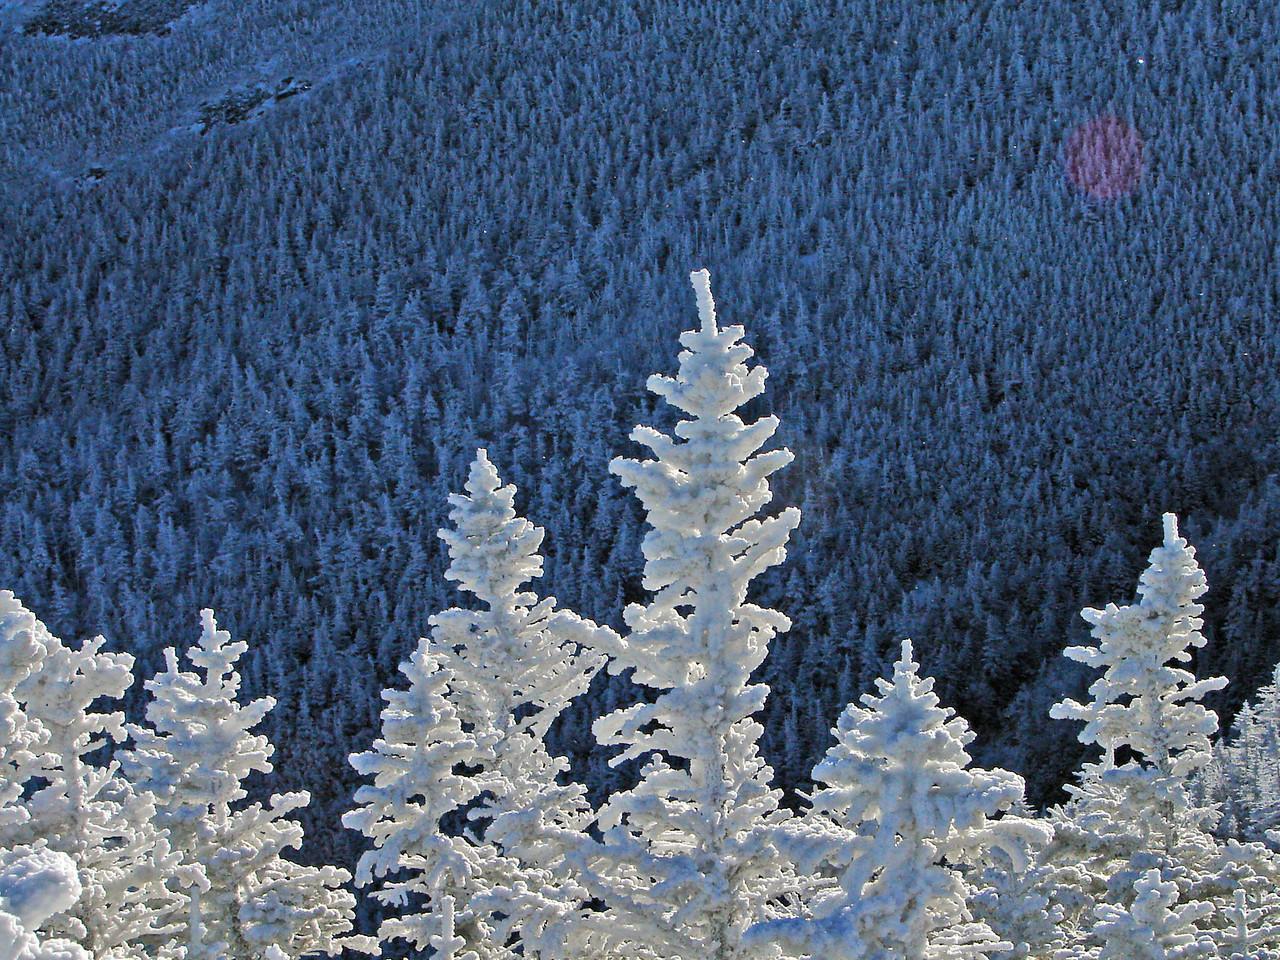 Christmas white. The snow frozen to the trees.